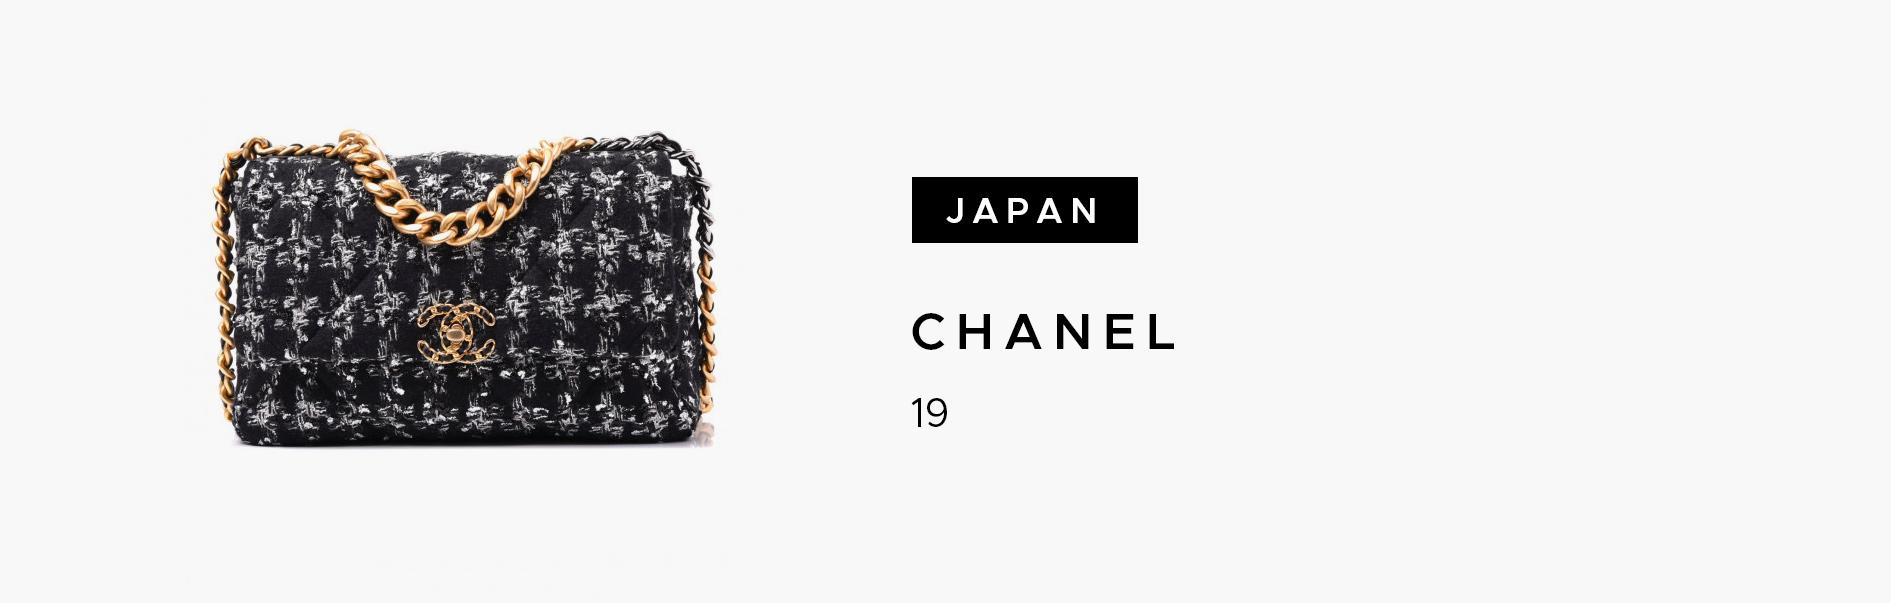 Japan Chanel 19